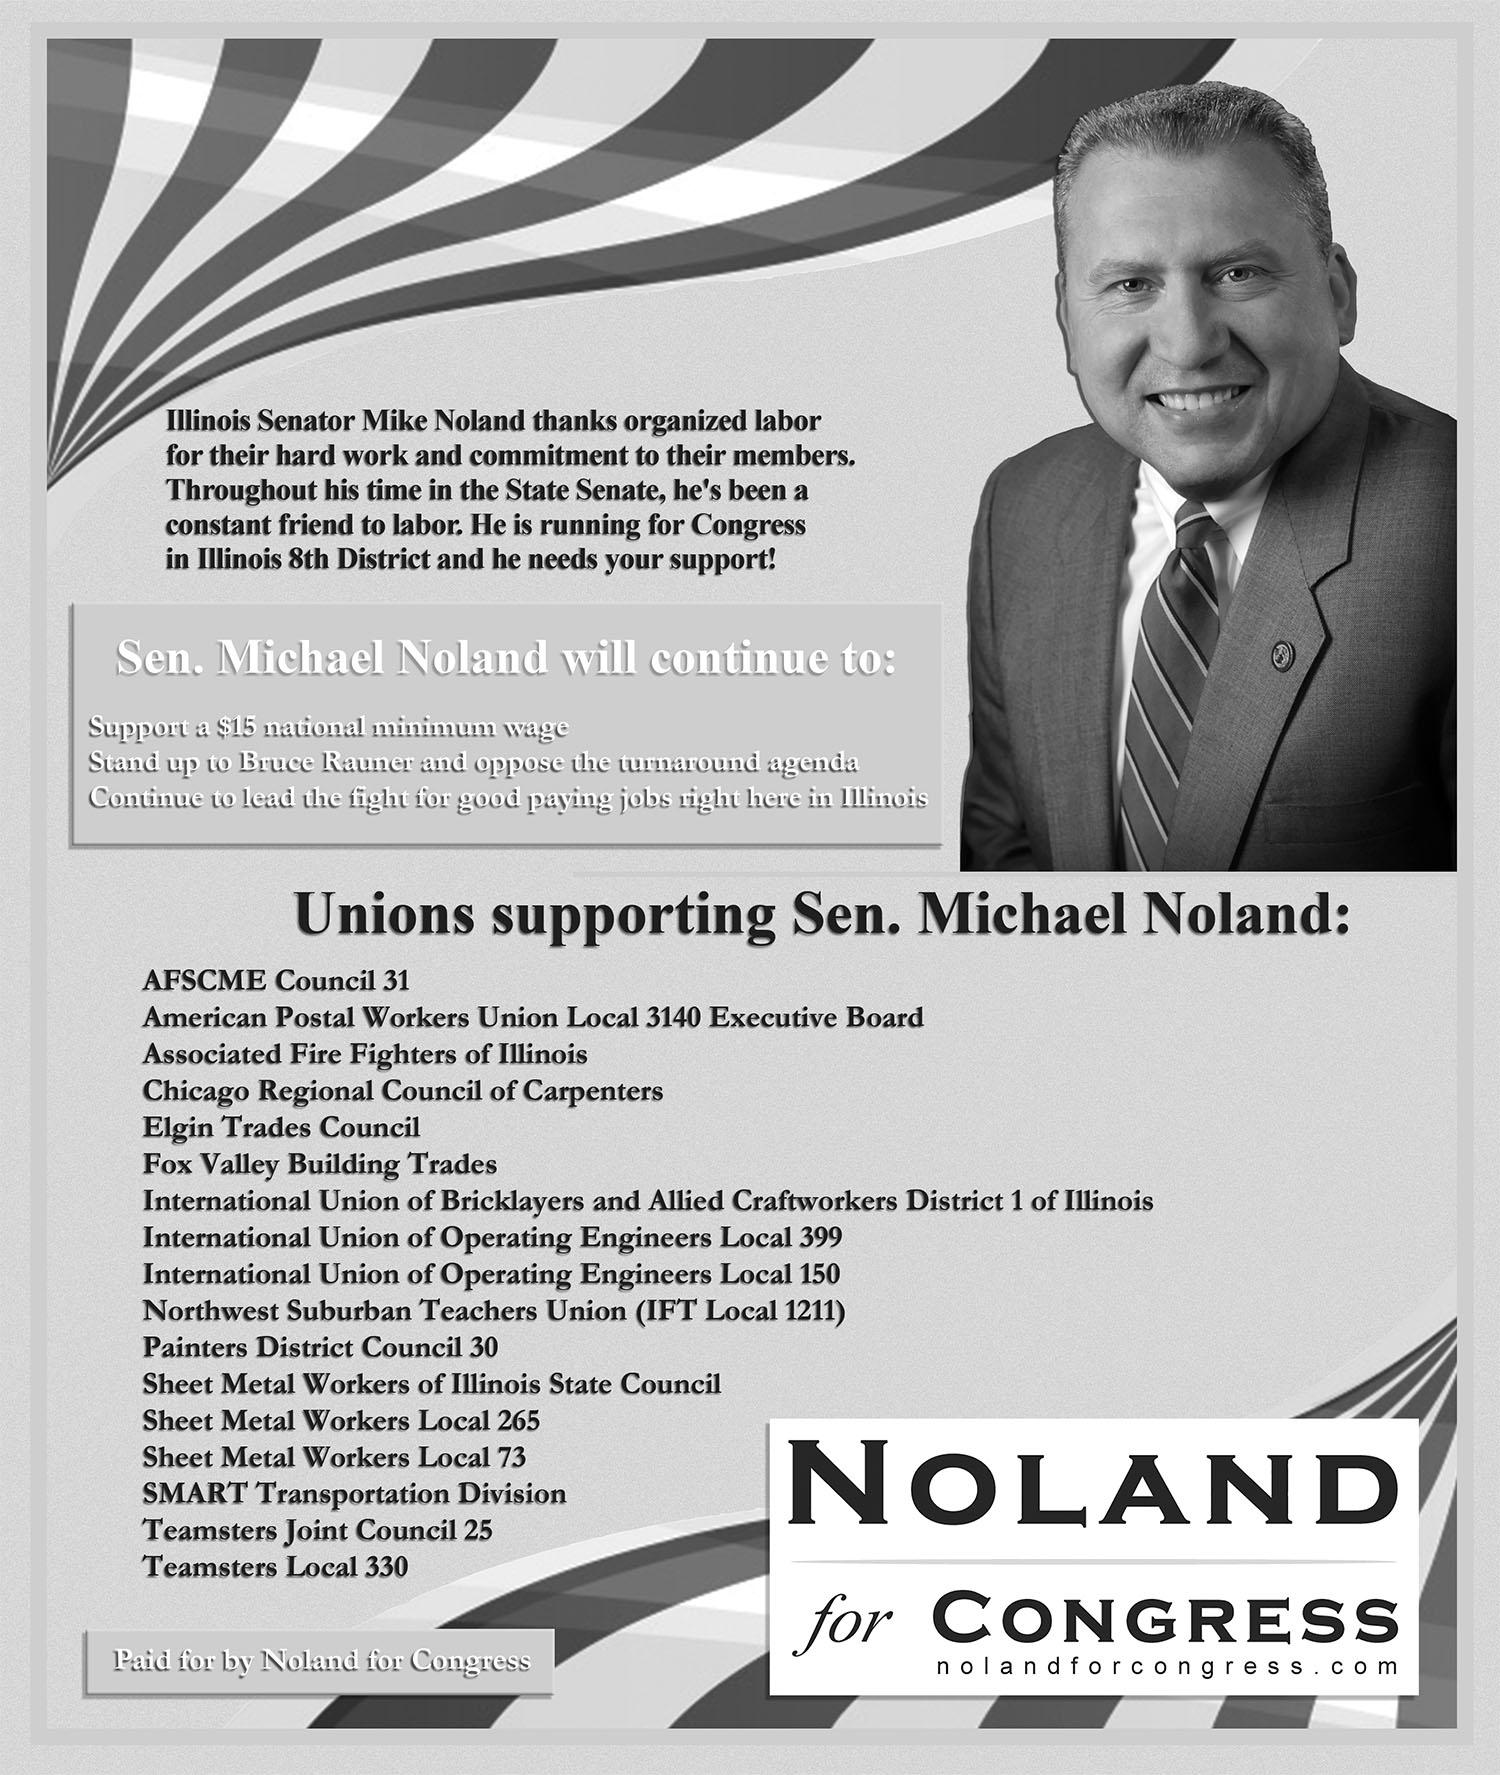 Senator Michael Noland